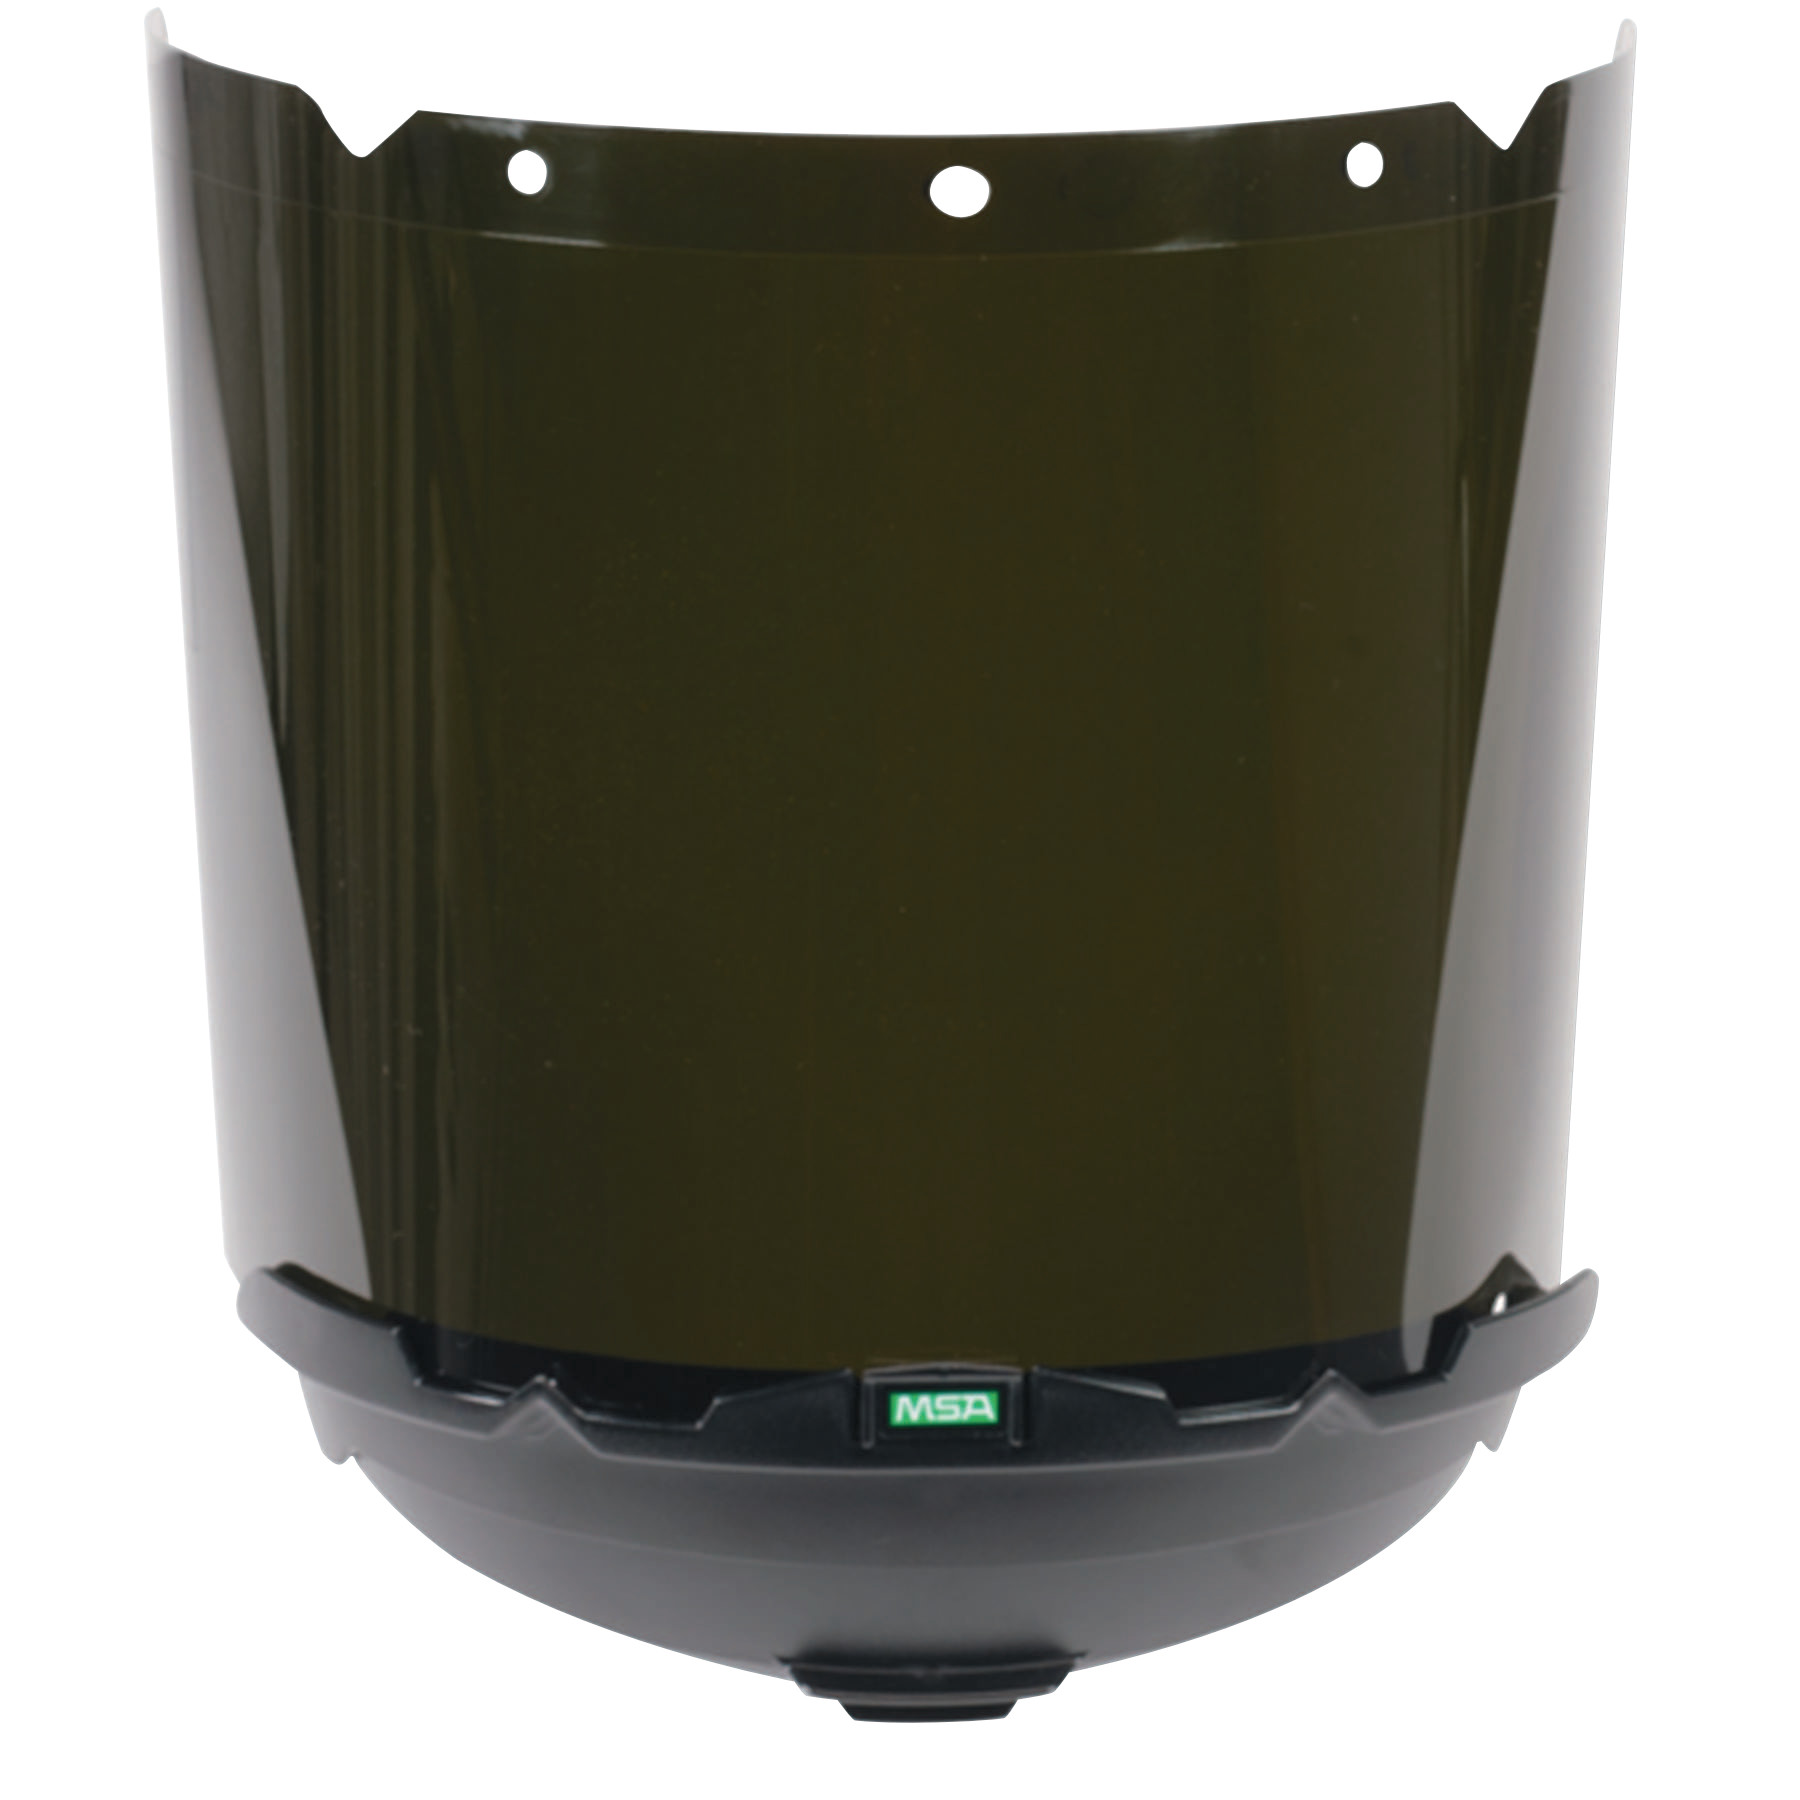 "MSA V-Gard Accessory System Welding/Cutting/Brazing Visors, Green, 17 1/4"" X 8"""